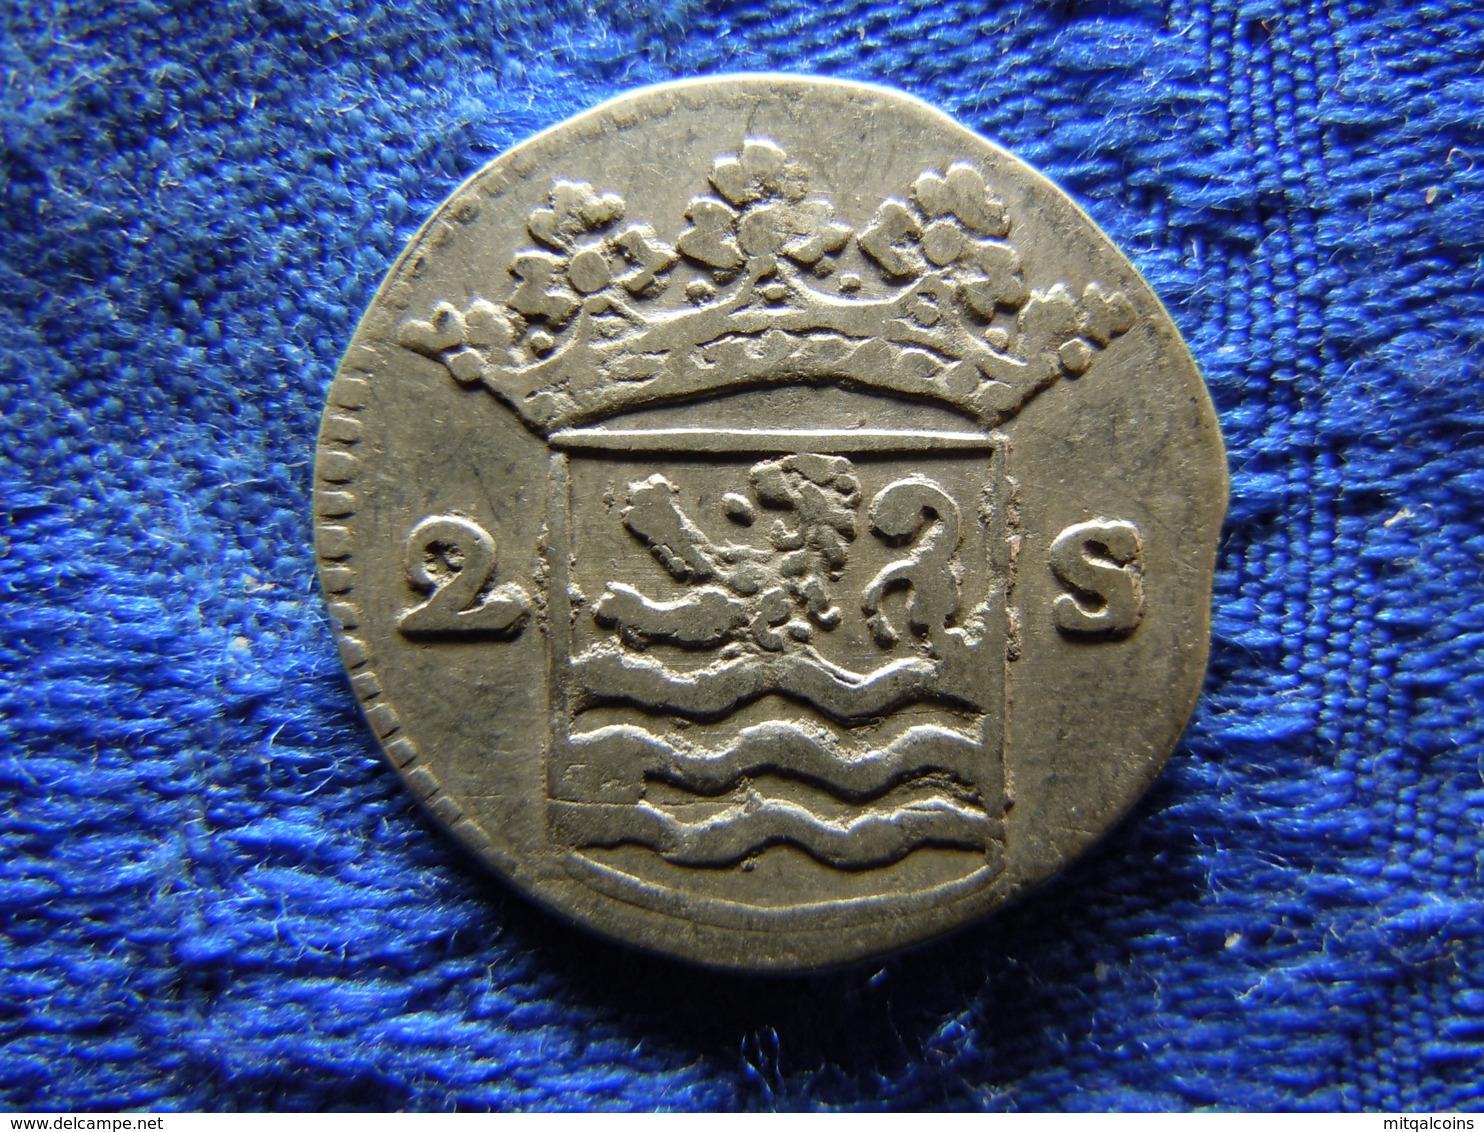 NETHERLANDS ZEELAND 2 STUIVERS 1733, KM59 - [ 1] …-1795 : Former Period